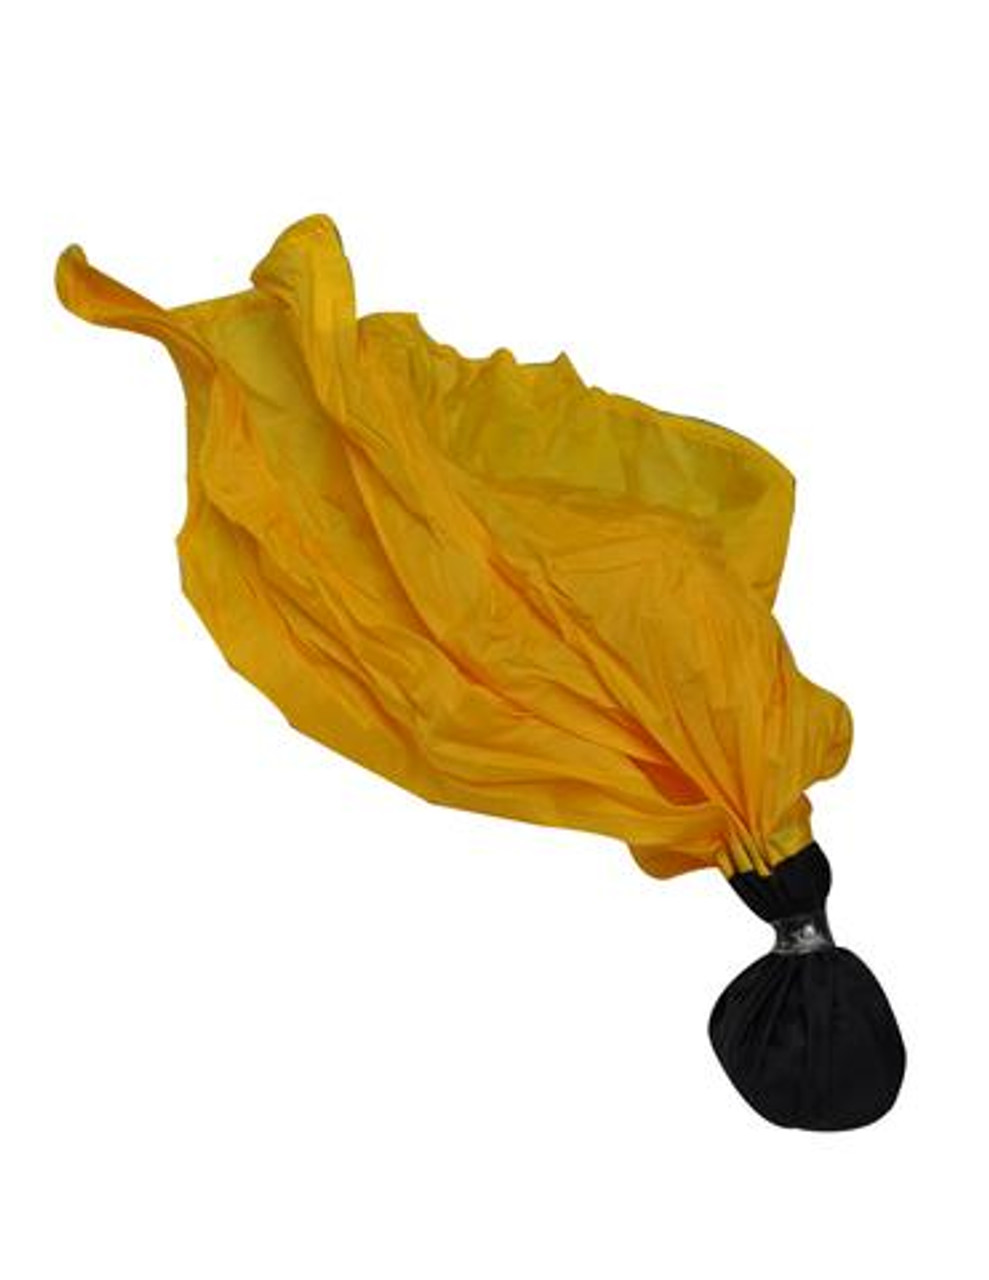 Smitty Black Ball Center Referee Penalty Flag